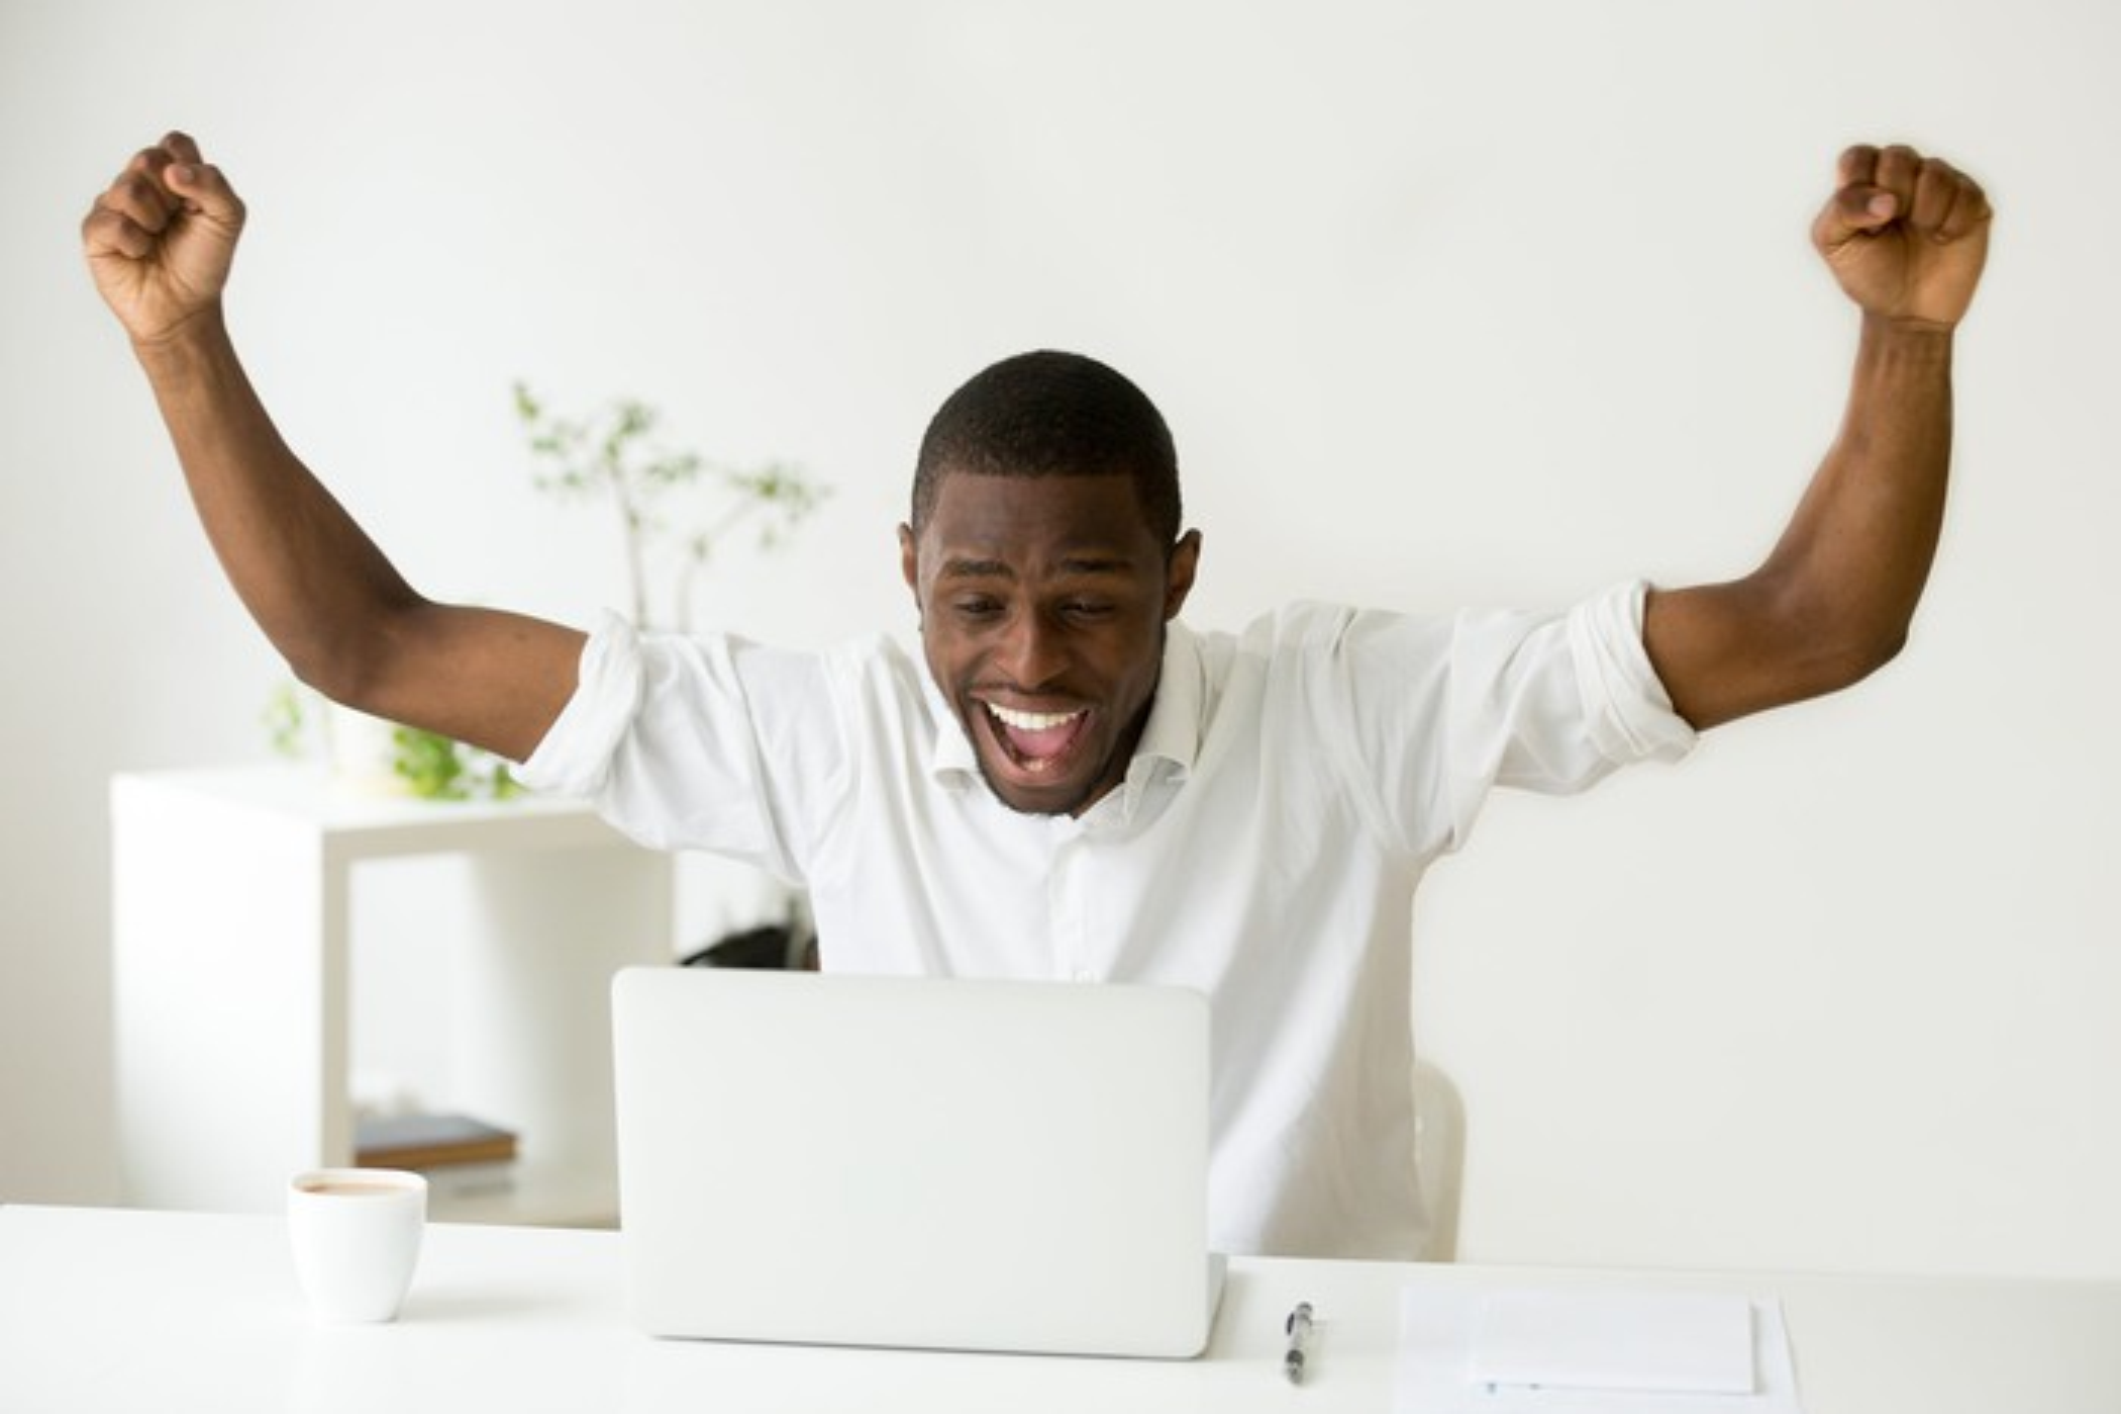 A man sitting at a computer raises his arms in triumph.